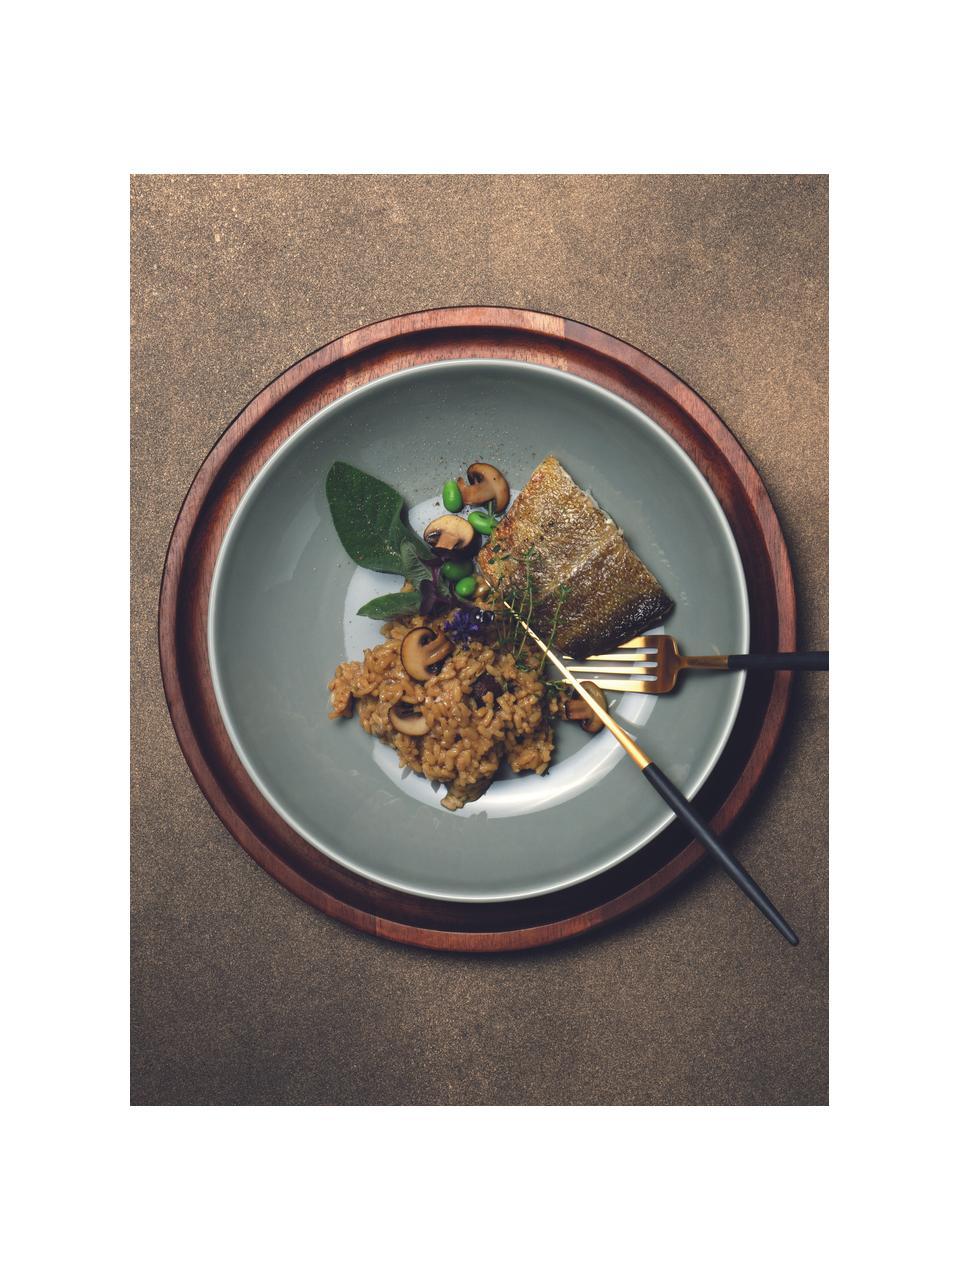 Porseleinen soepborden Kolibri in glanzend grijs, 6 stuks, Porselein, Grijs, Ø 24 cm